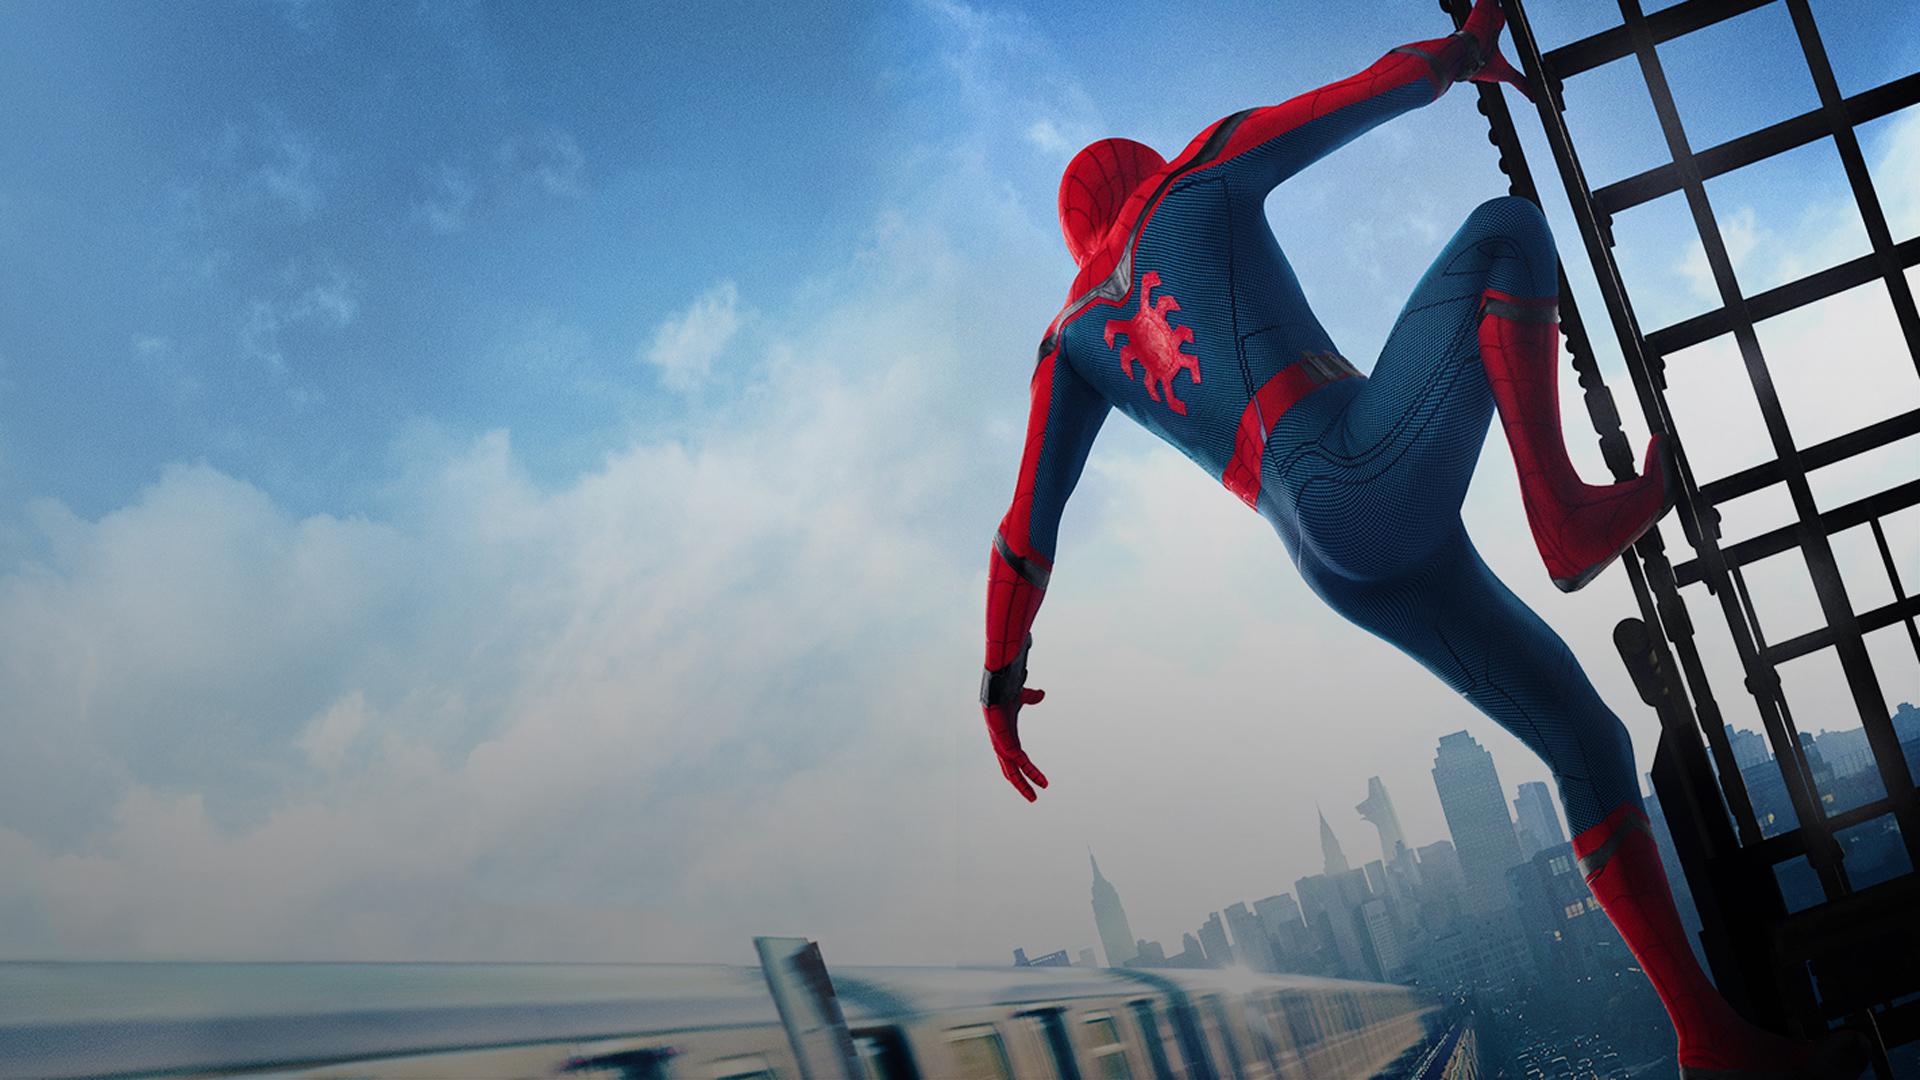 Wallpaper Spider Man Homecoming 2017 Spider Man 1920x1080